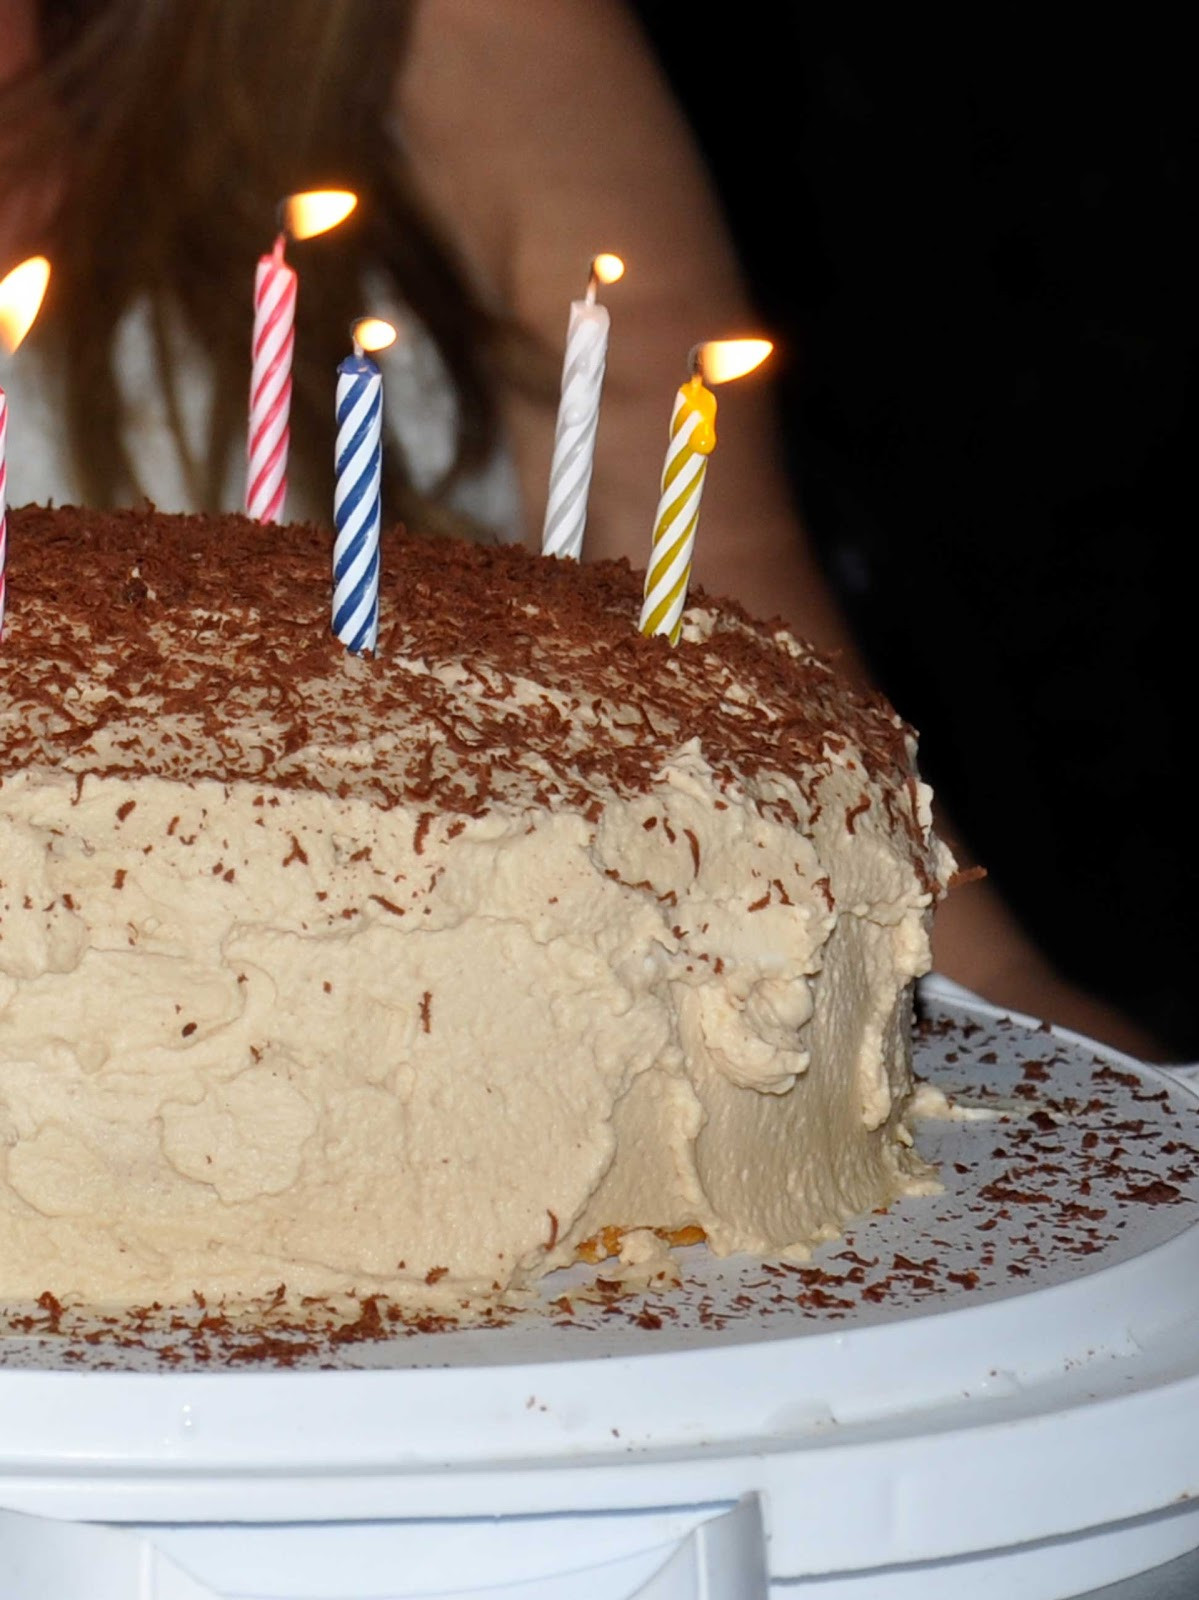 Best ideas about Tiramisu Birthday Cake . Save or Pin Maple Macaroni Tiramisu Birthday Cake Now.